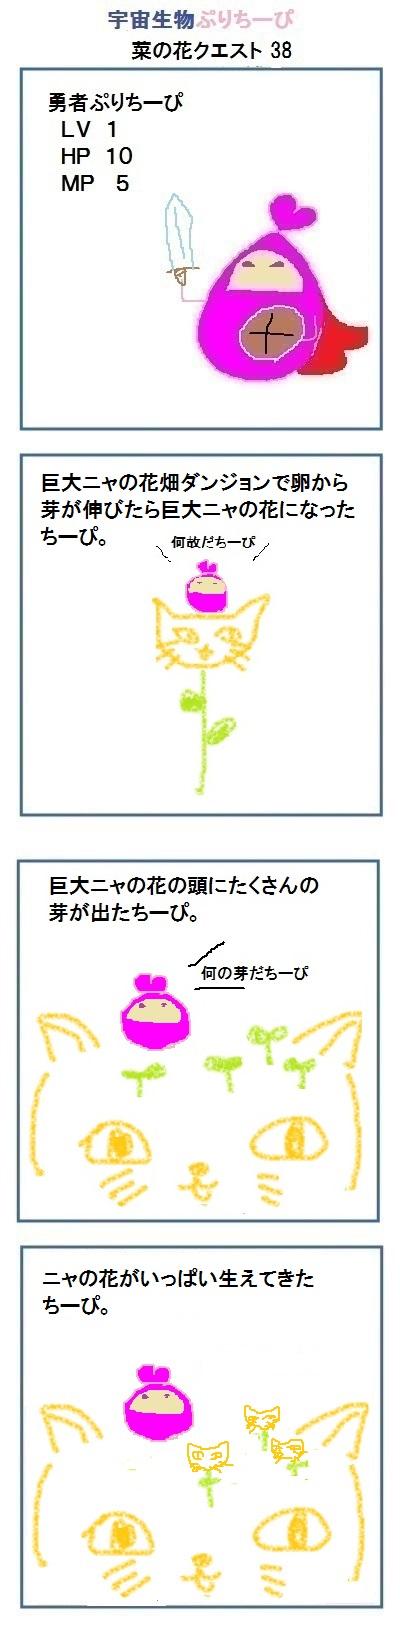 160421_nanohana_quest38.jpg